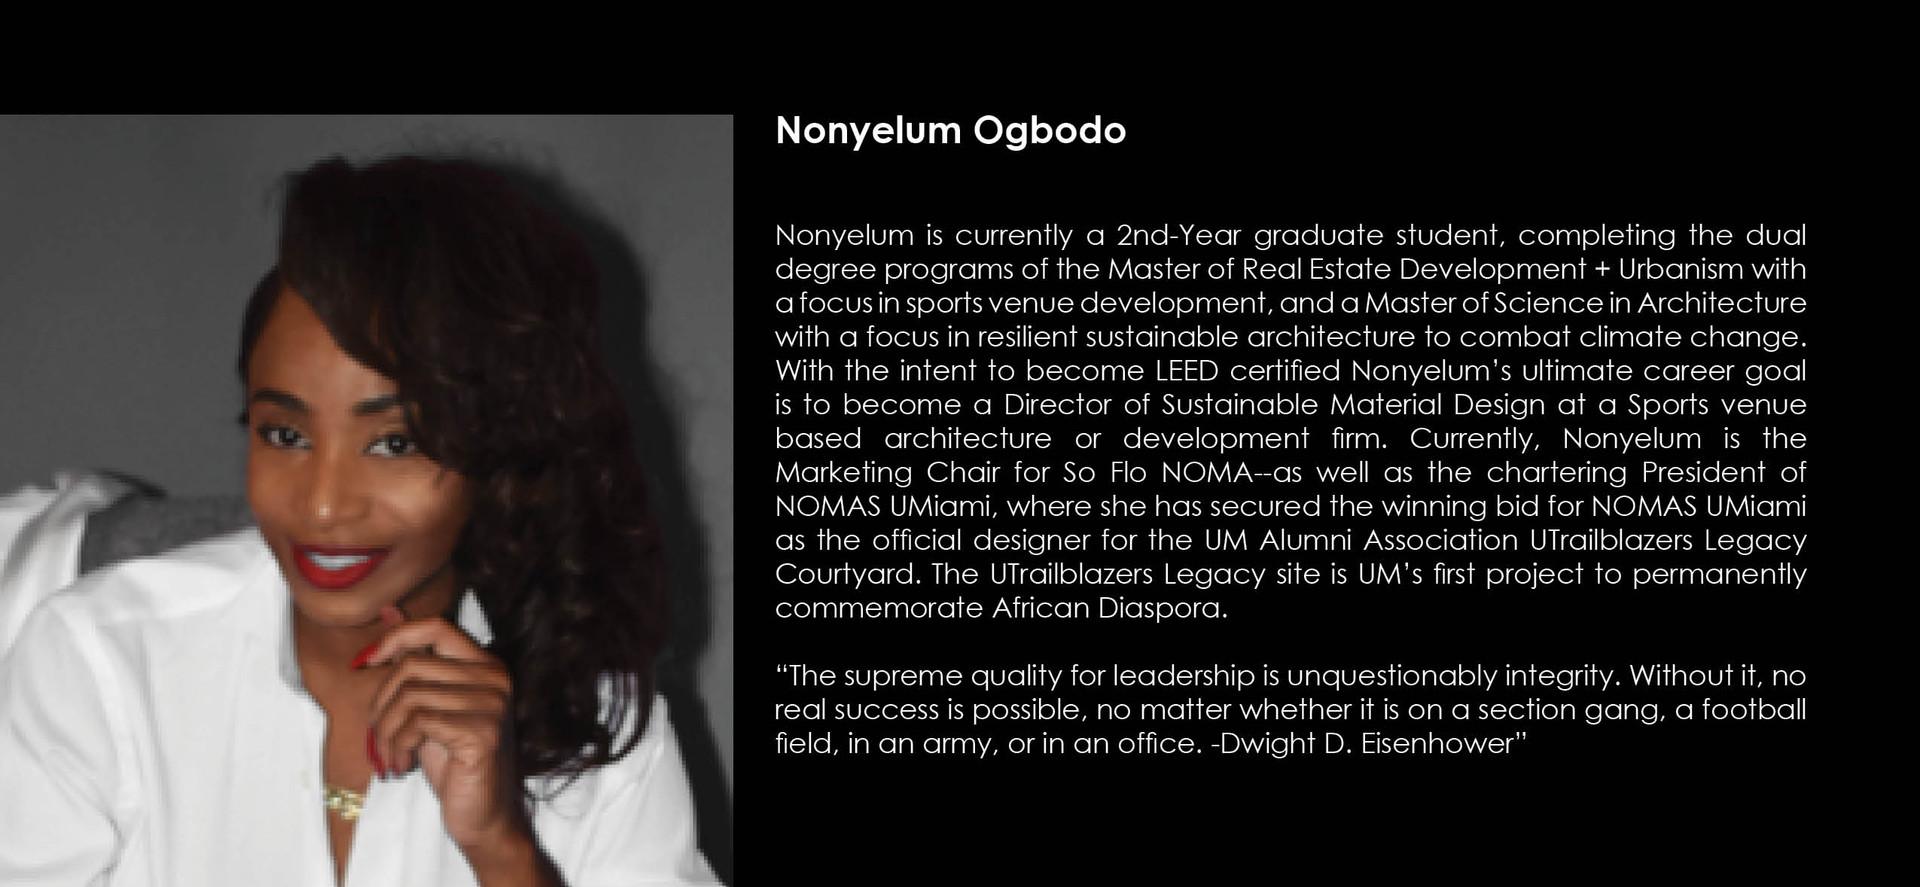 Nonyelum Agbodo